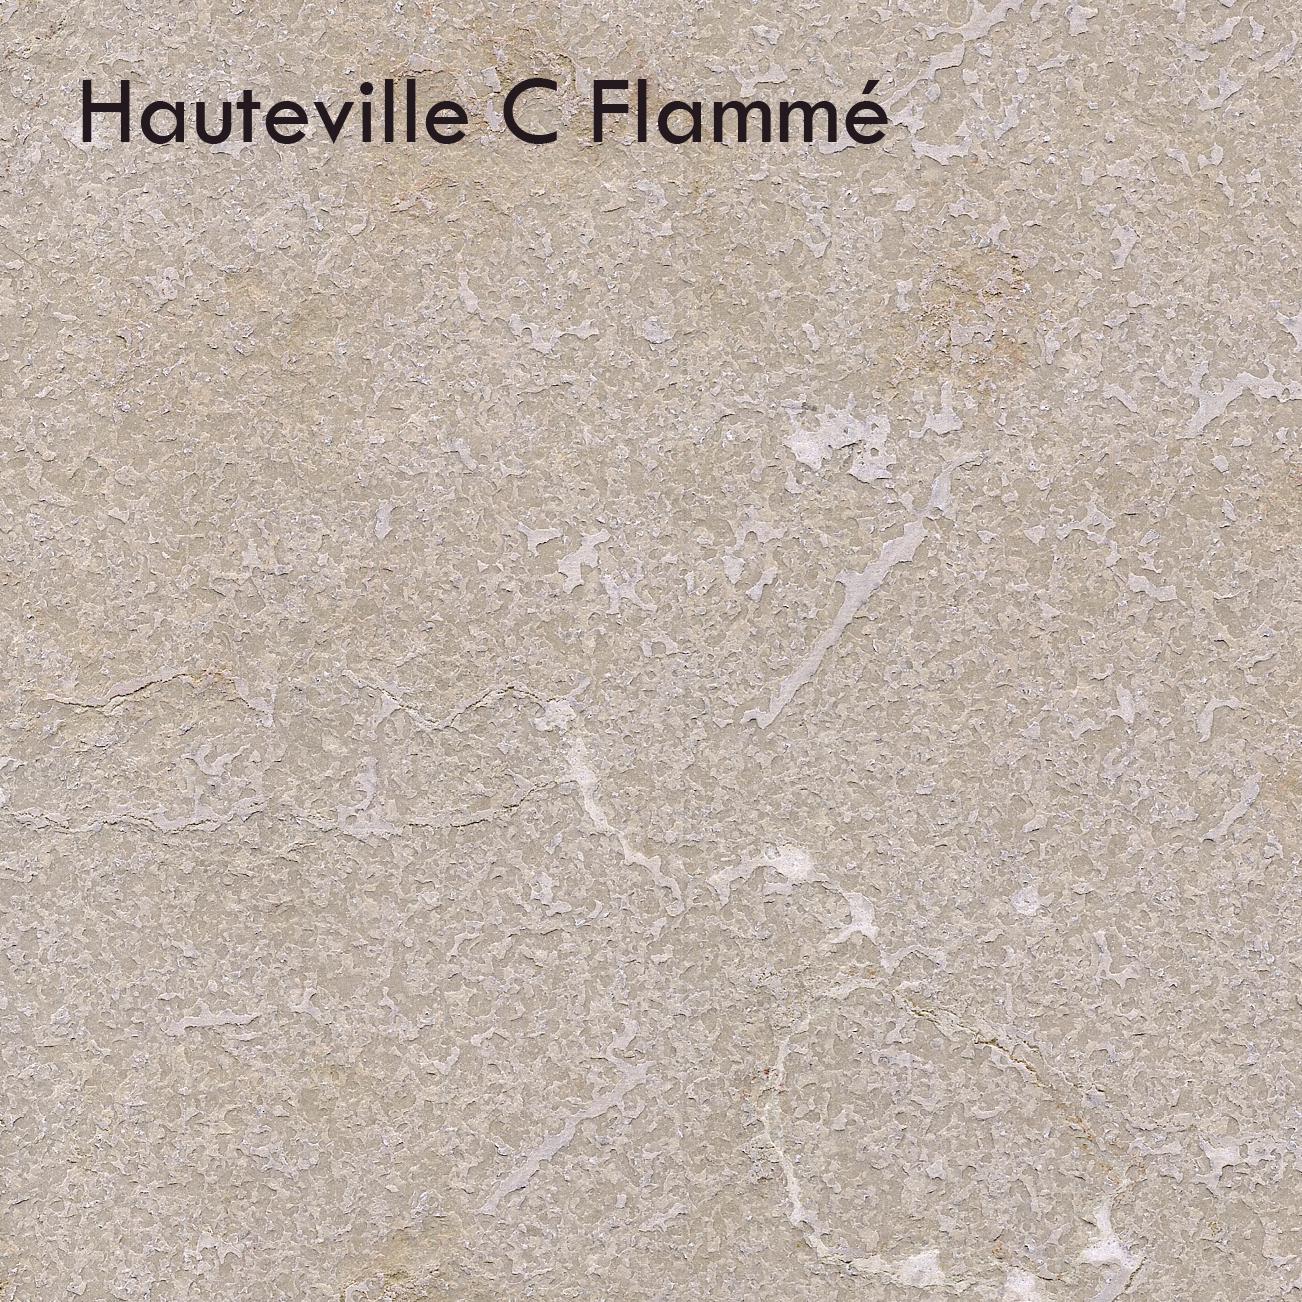 Hauteville C flammé